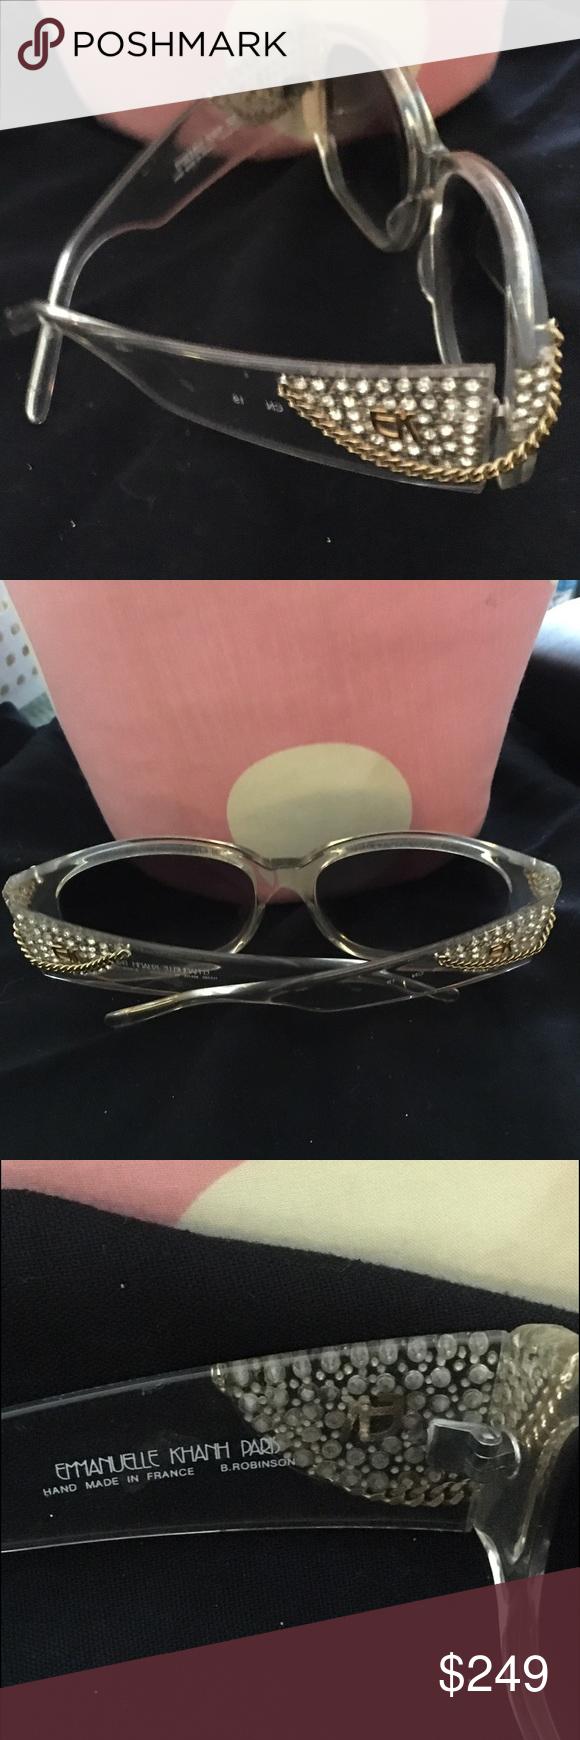 c42553c6daf Vintage rare emmanuell khahn paris clear sunglass pinterest png 580x1740  Emmanuel kahn sunglasses paris